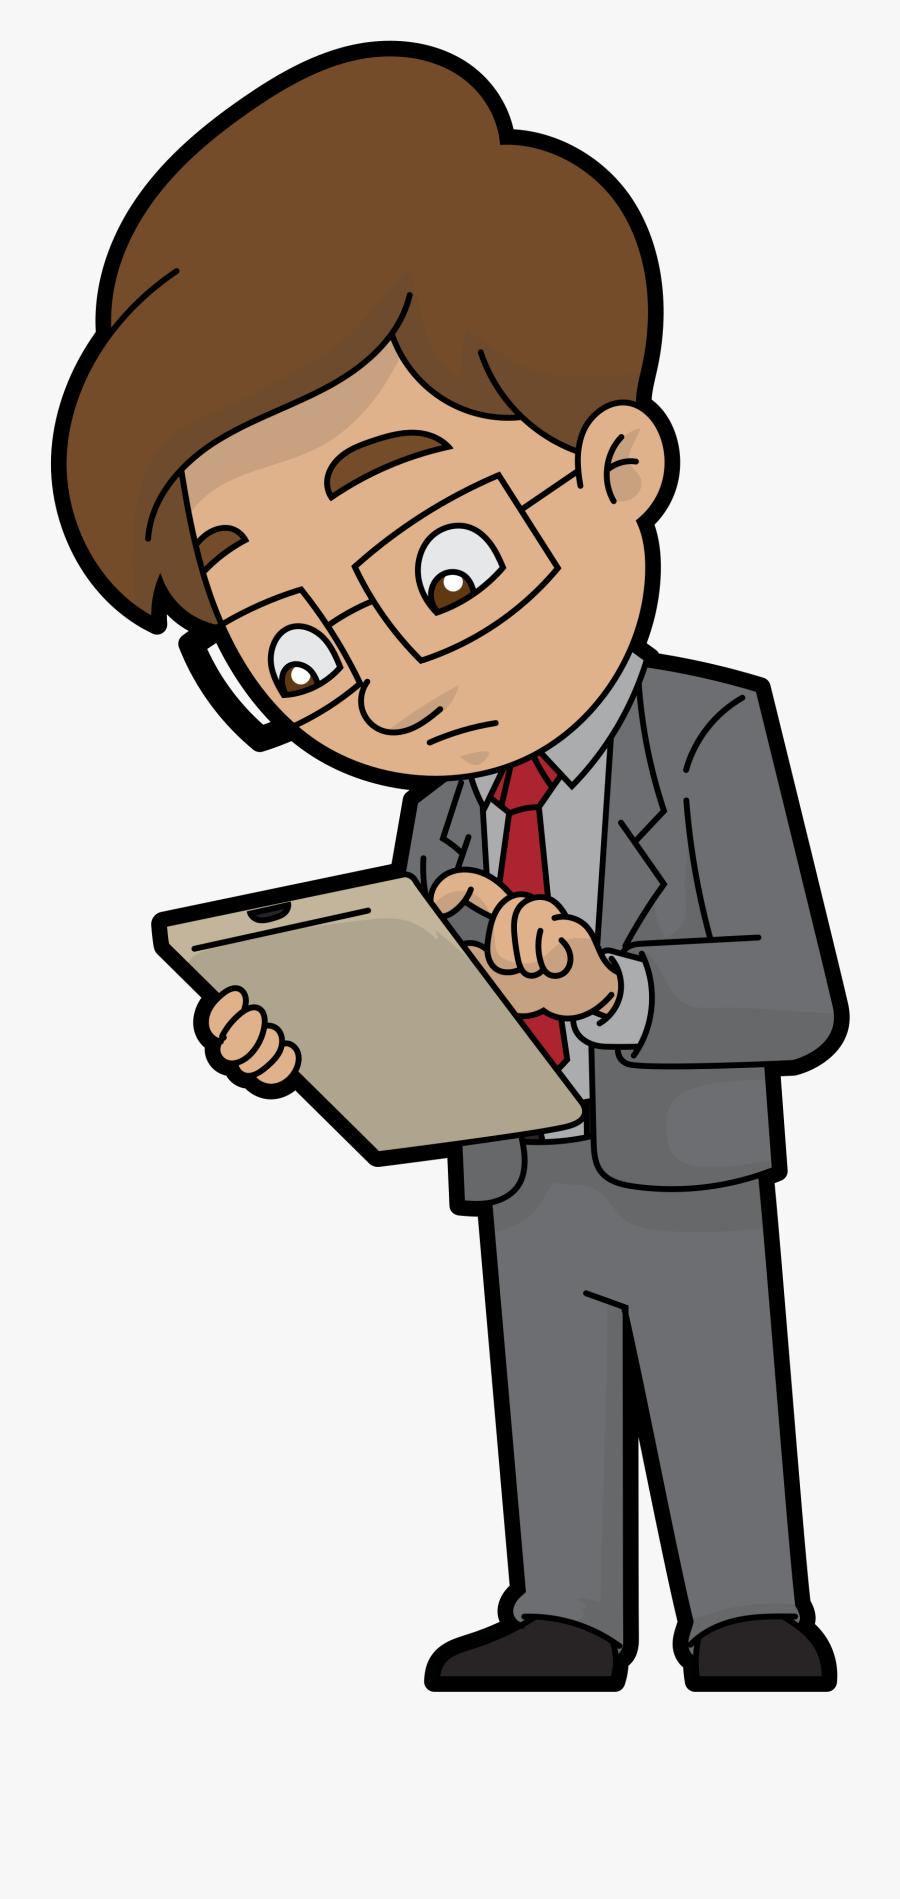 Transparent Hypothesis Clipart - Cartoon Man With Clipboard, Transparent Clipart